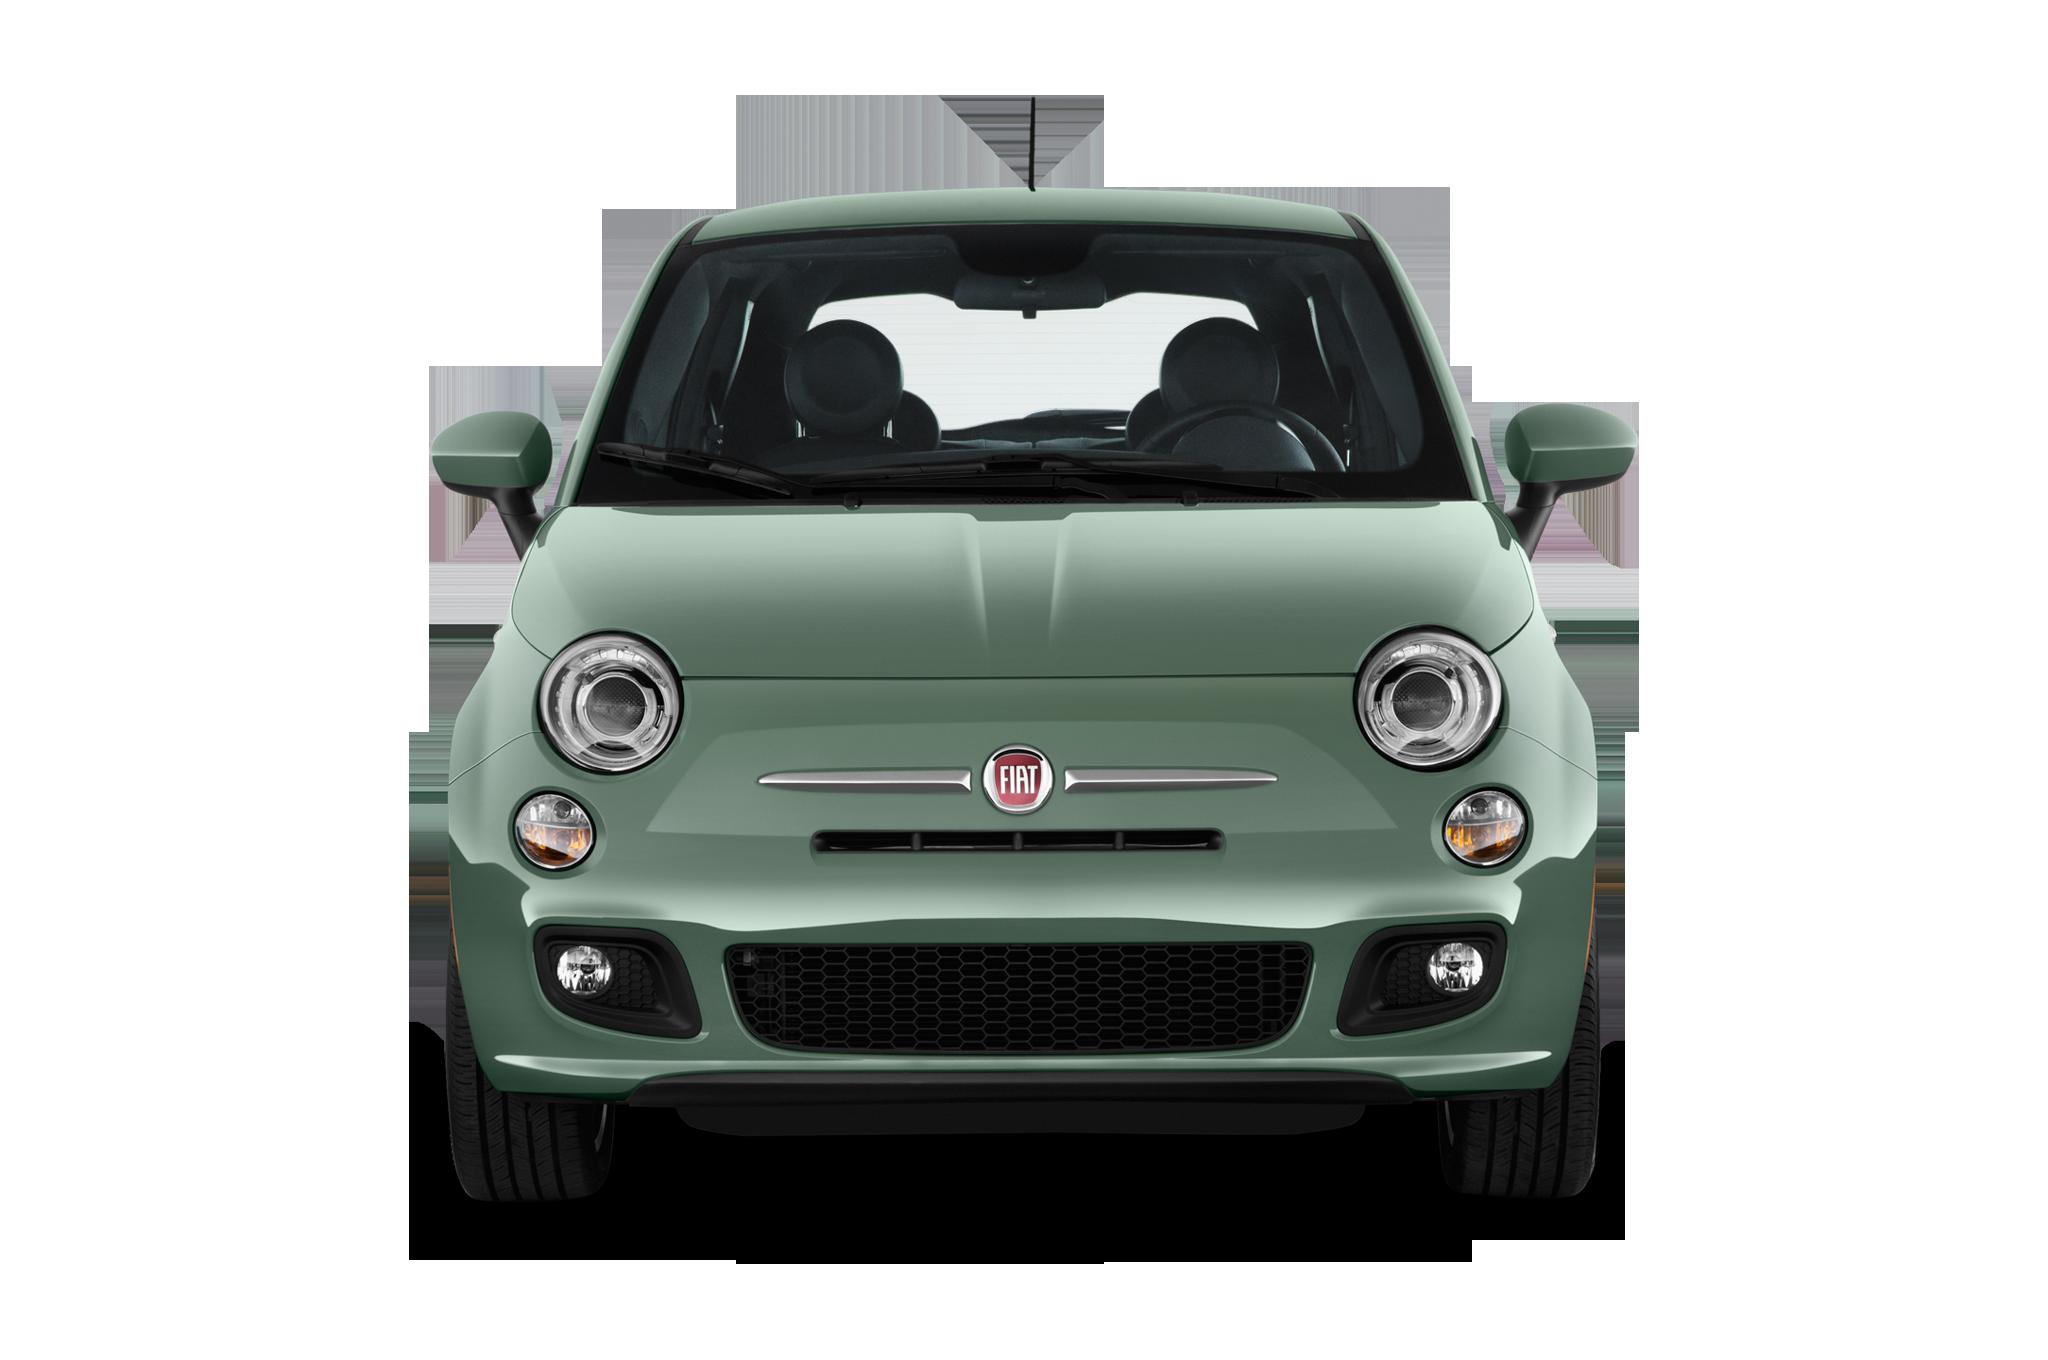 2015 Fiat 500 Abarth Automatic Around The Block